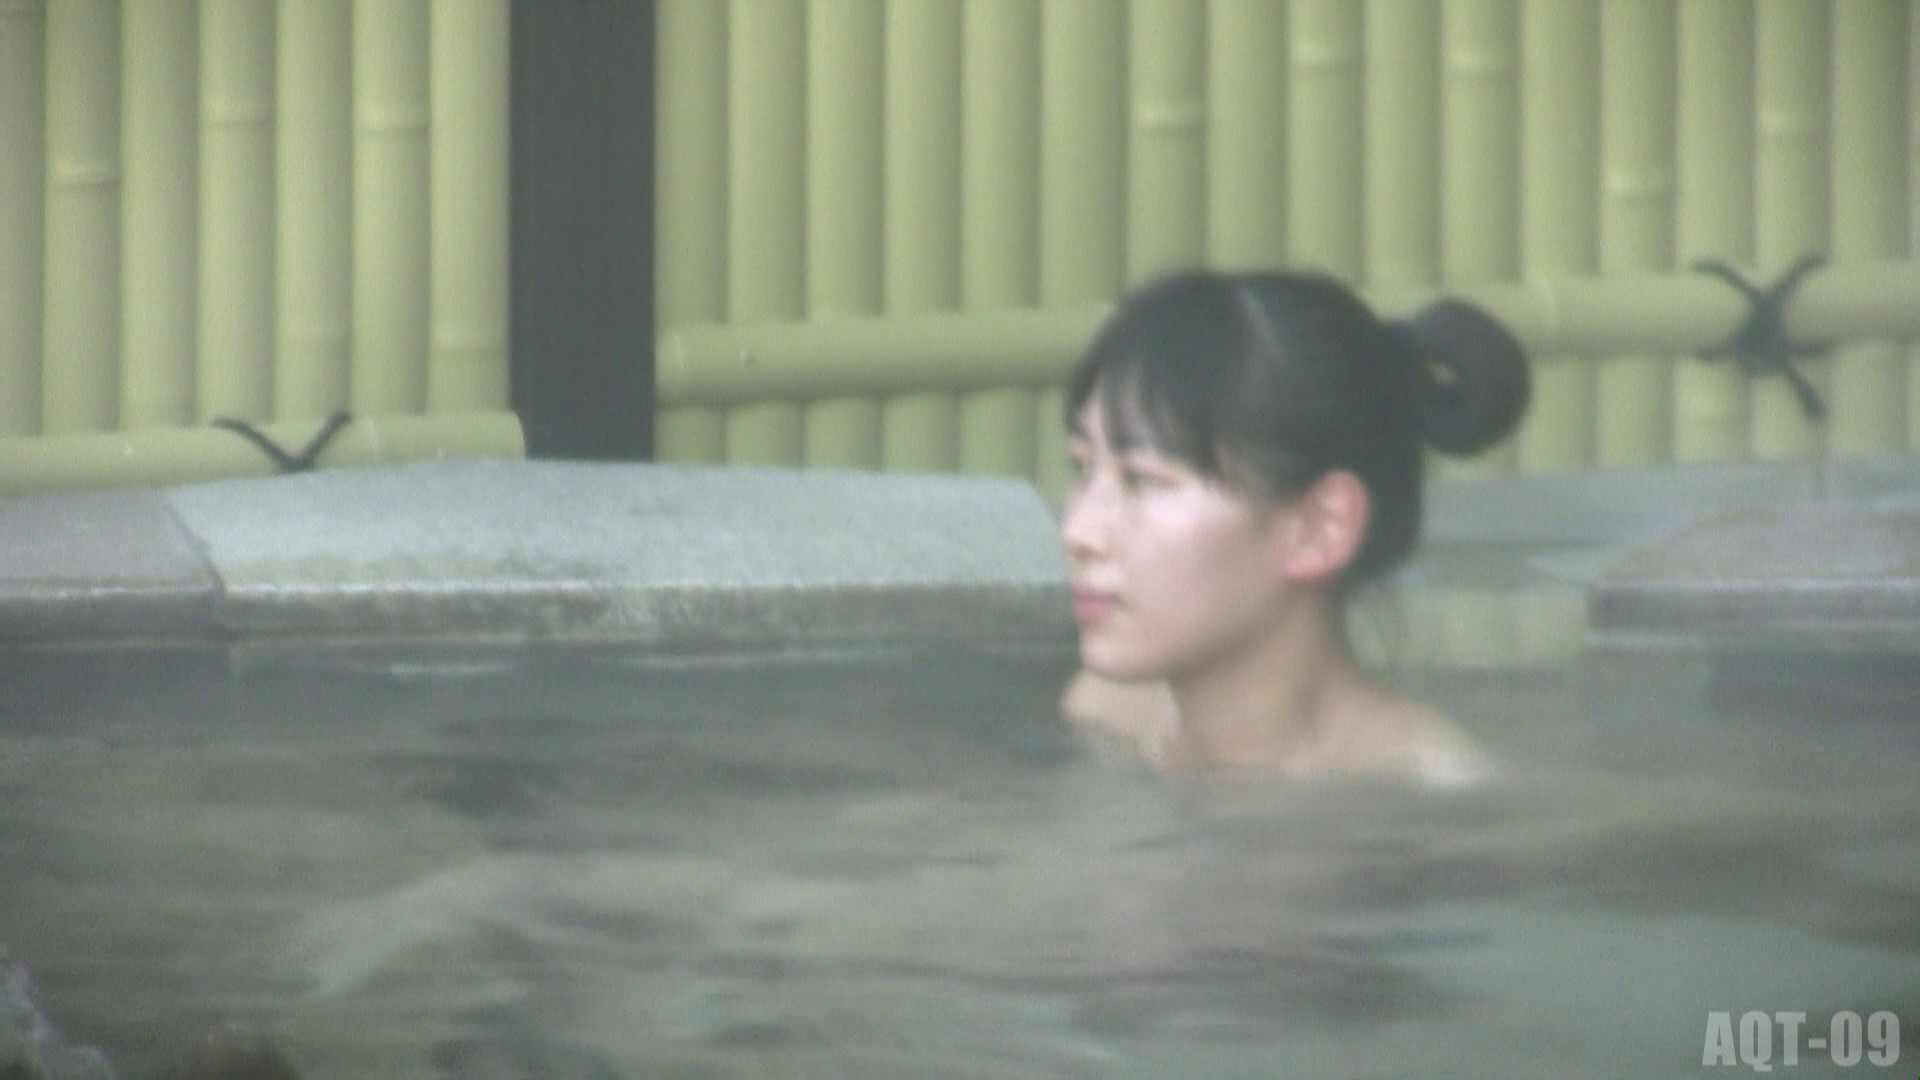 Aquaな露天風呂Vol.785 露天風呂編  110PIX 14